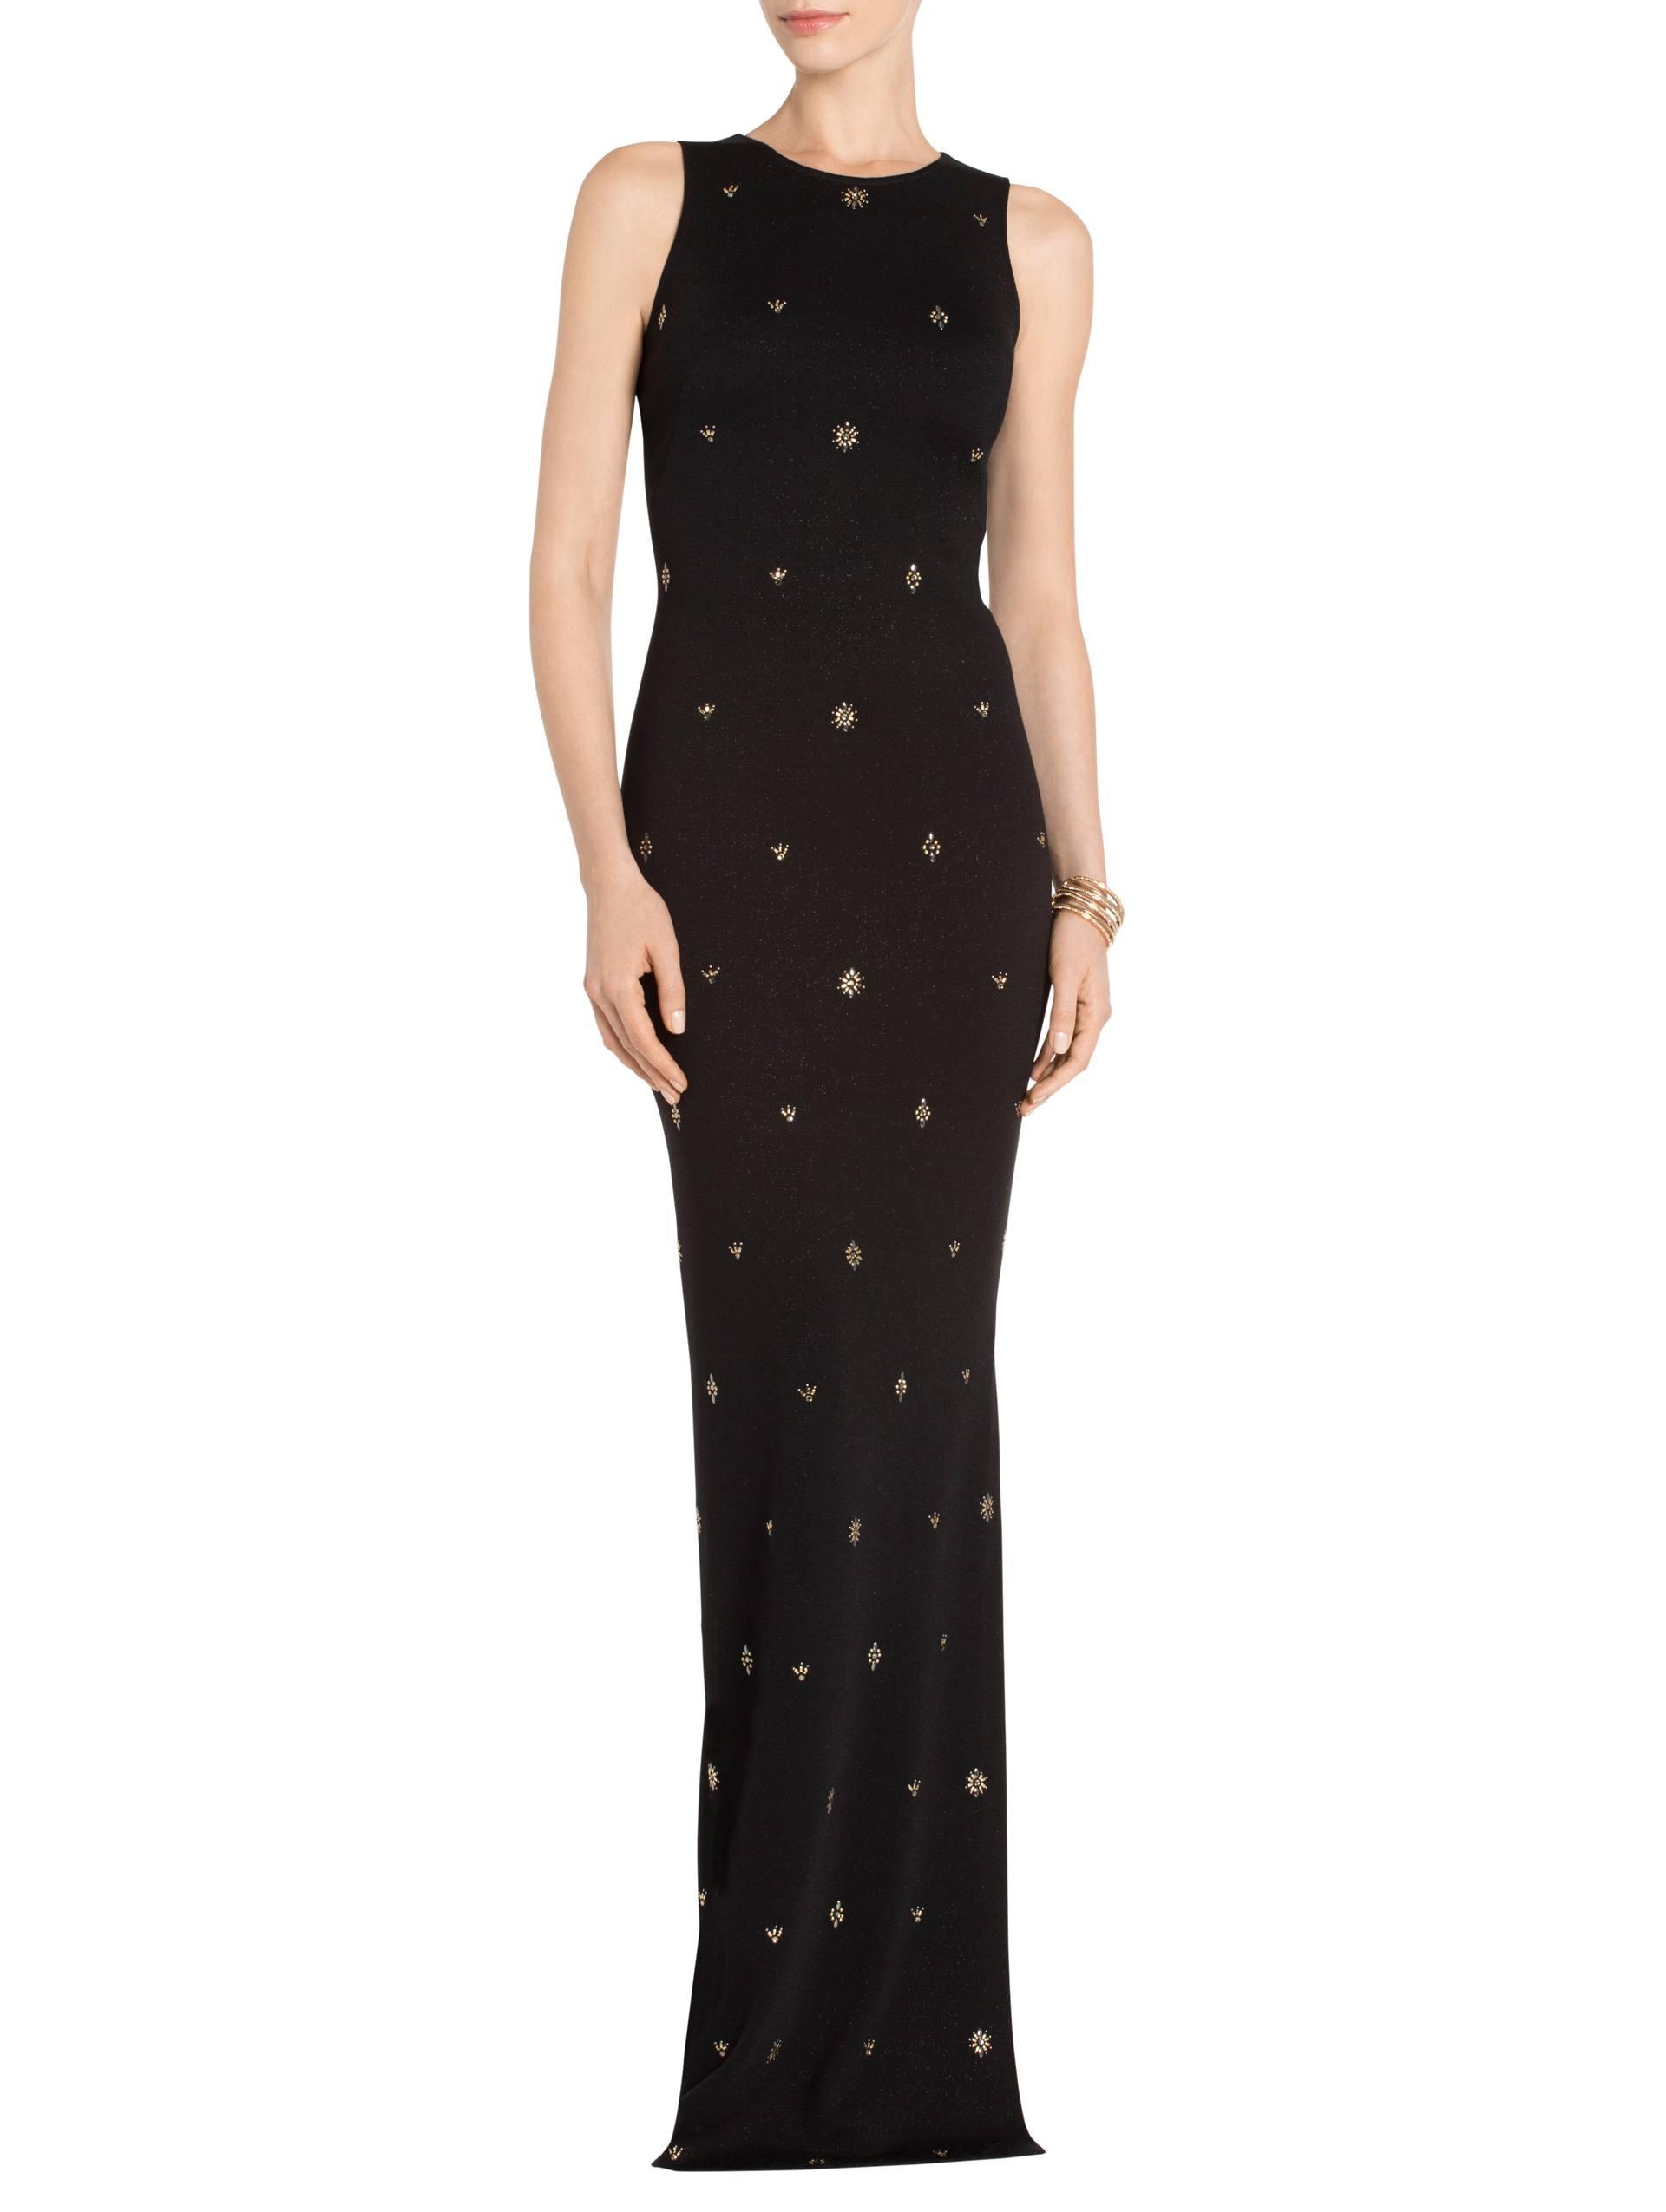 Women\'s Shimmer Milano Knit Jewel Neck Halter Gown   St. John Knits